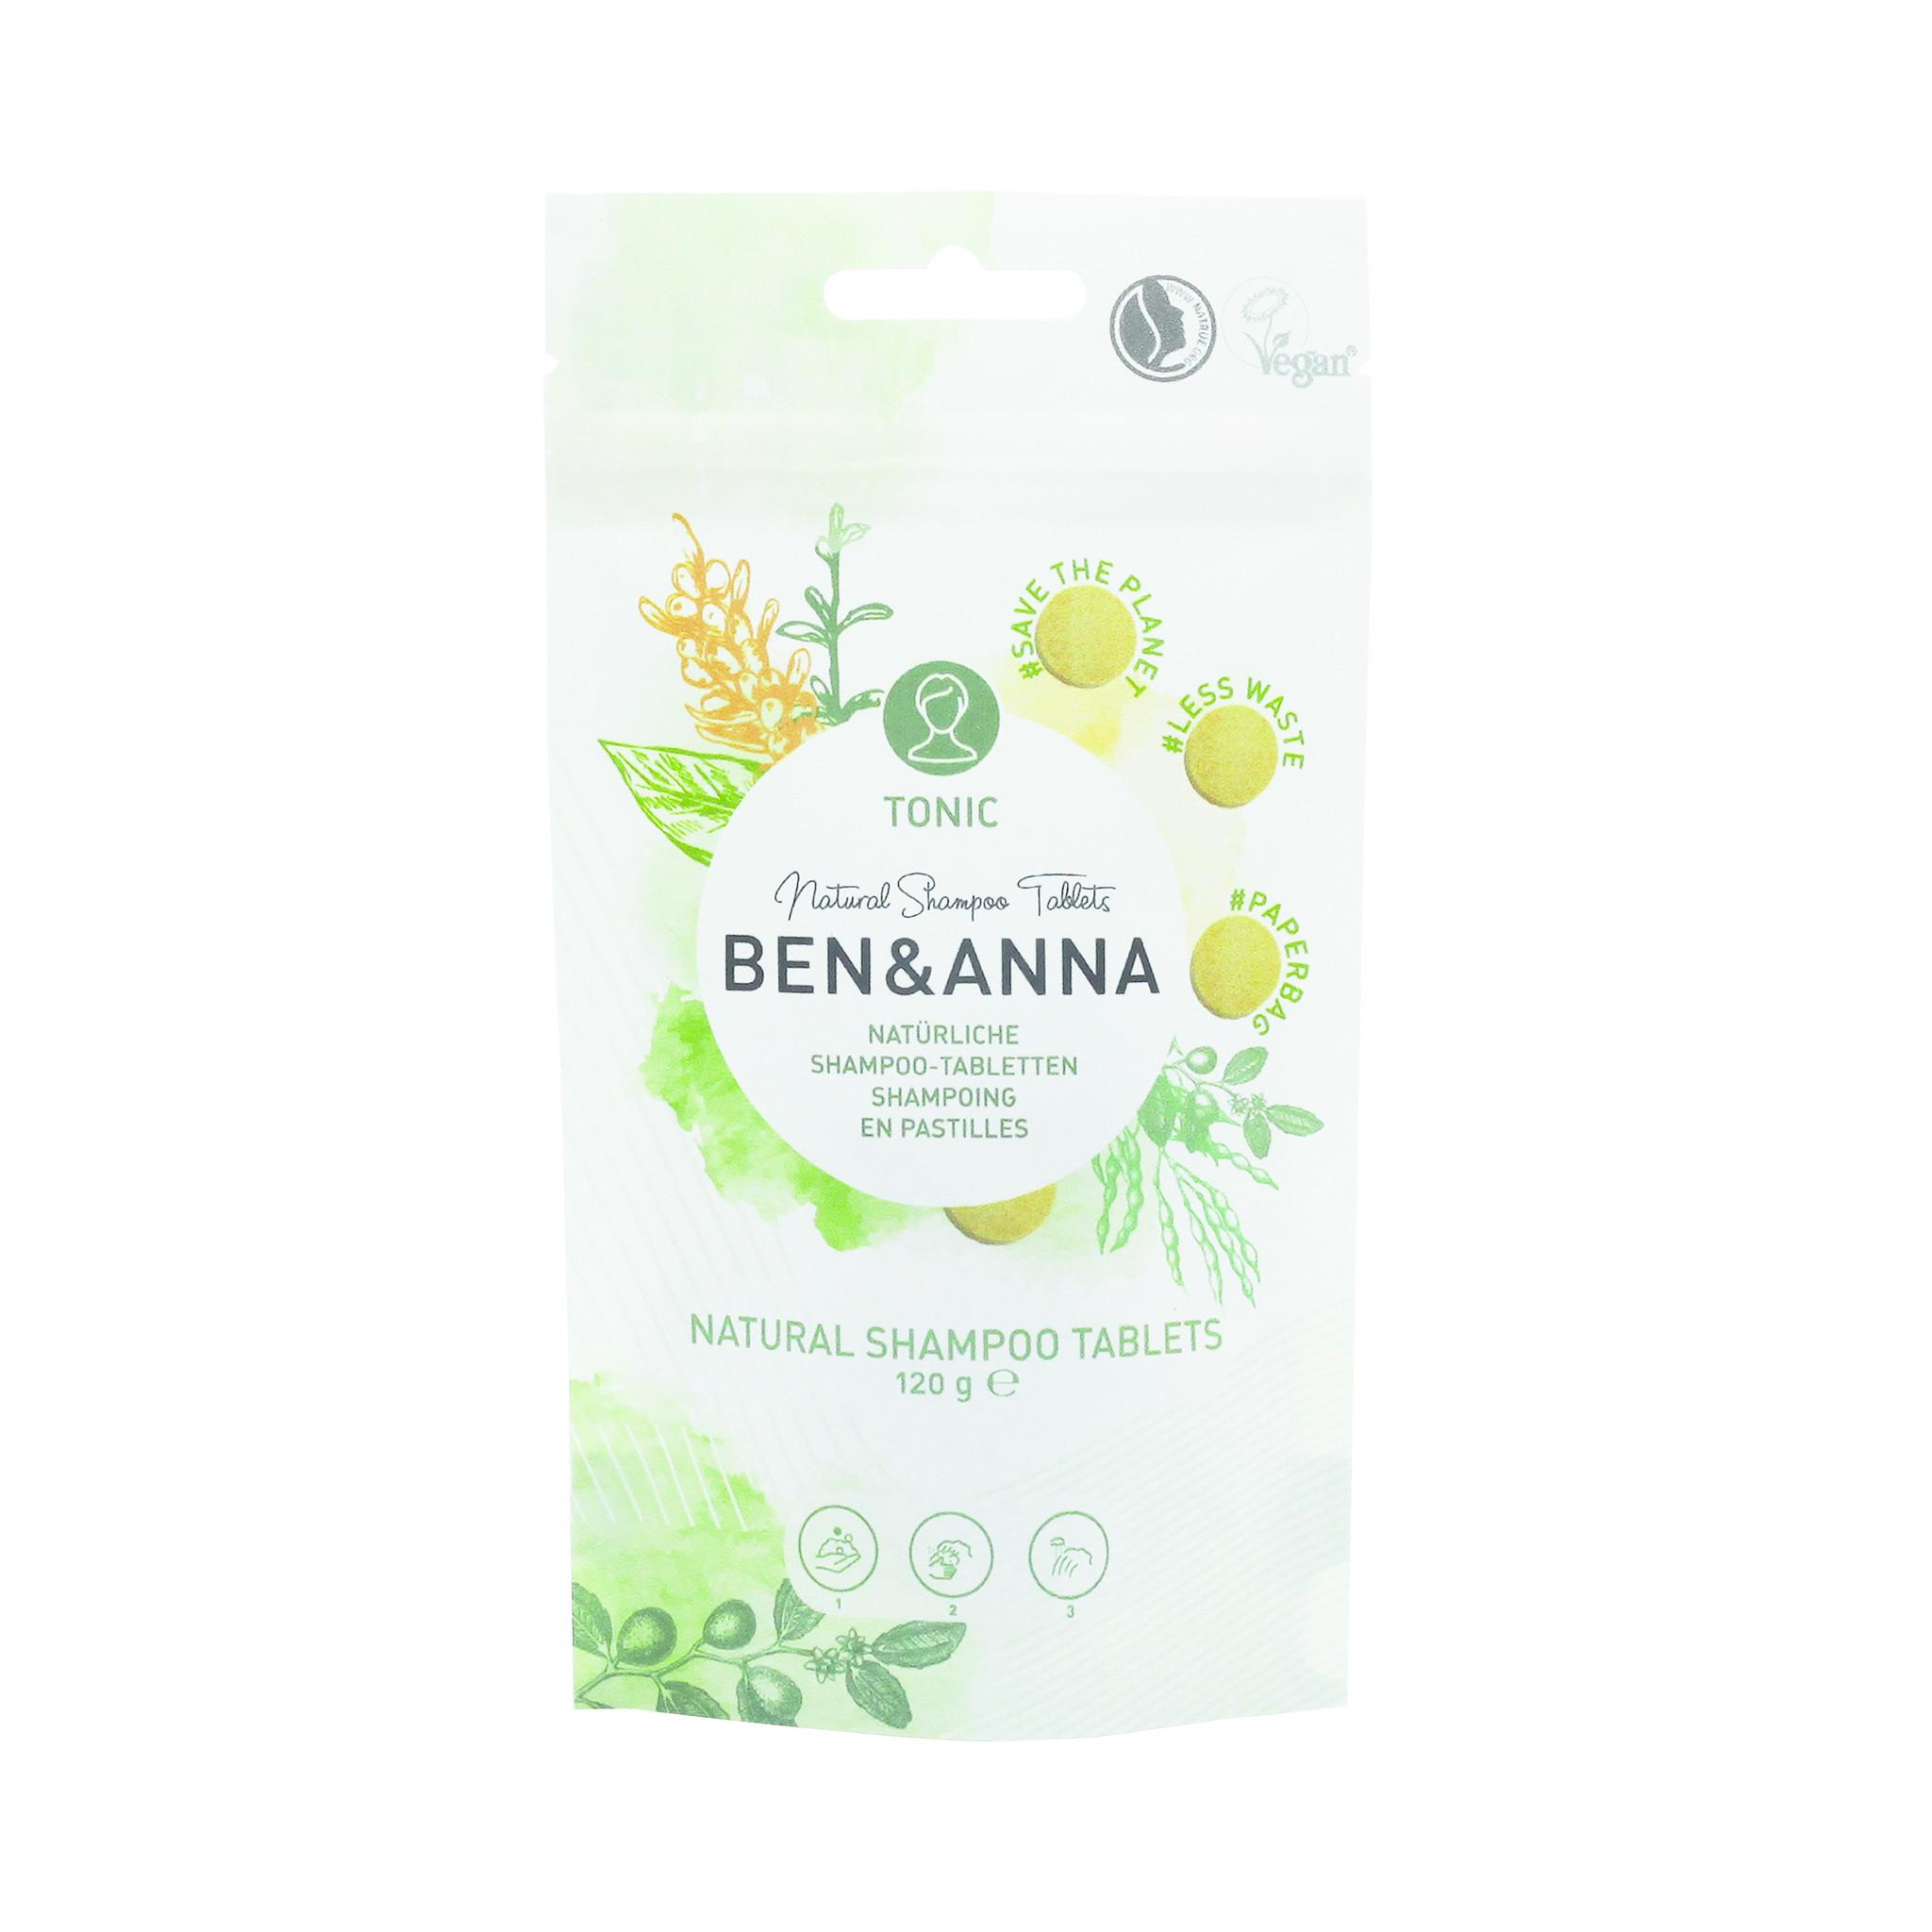 Ben & Anna Natuurlijke Shampootabletten - Tonic